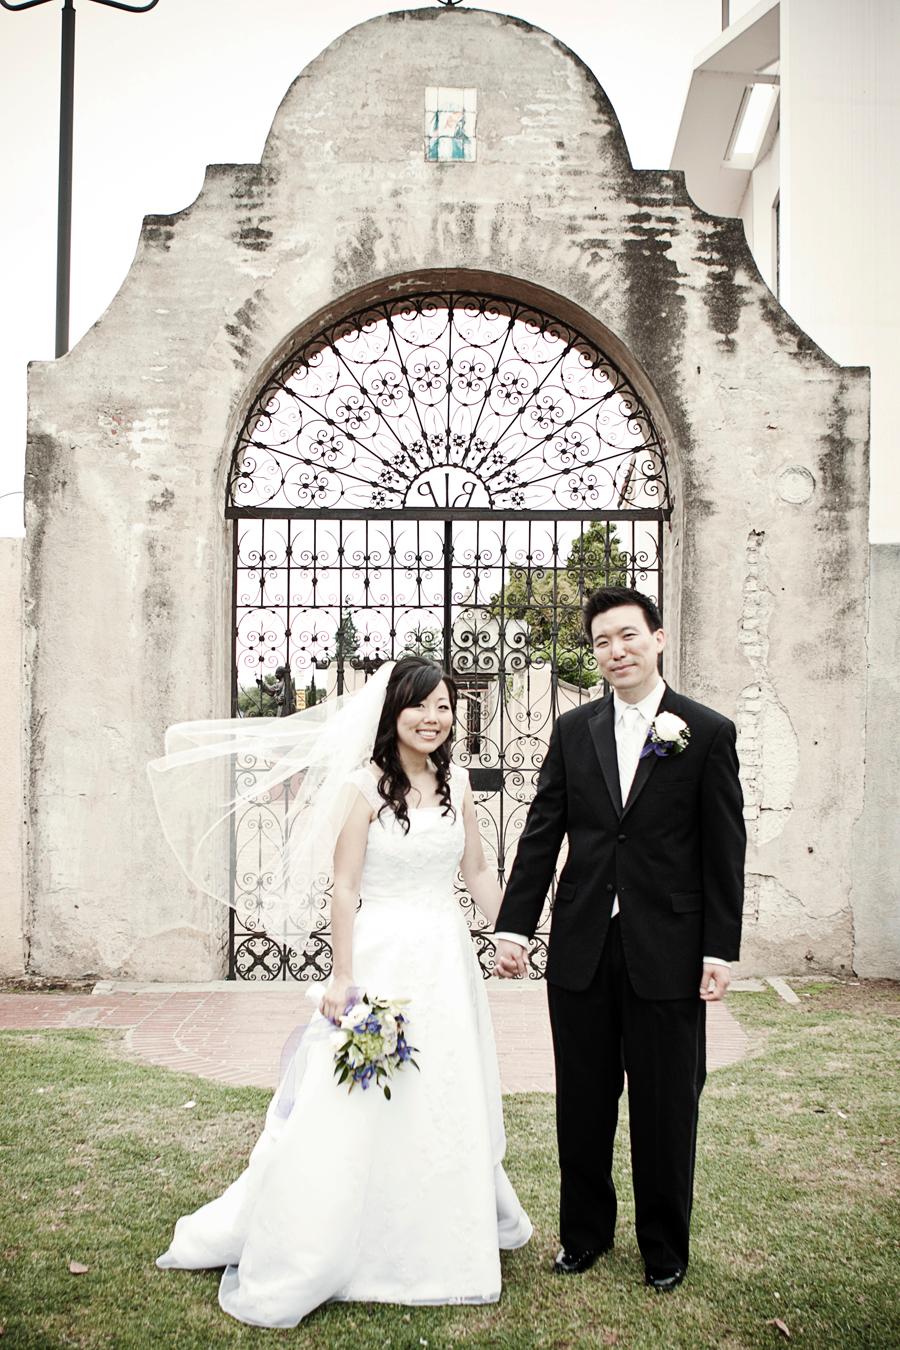 韓國婚紗造型 自助婚紗 分享〈第一集〉 @ Samantha Color …_插圖